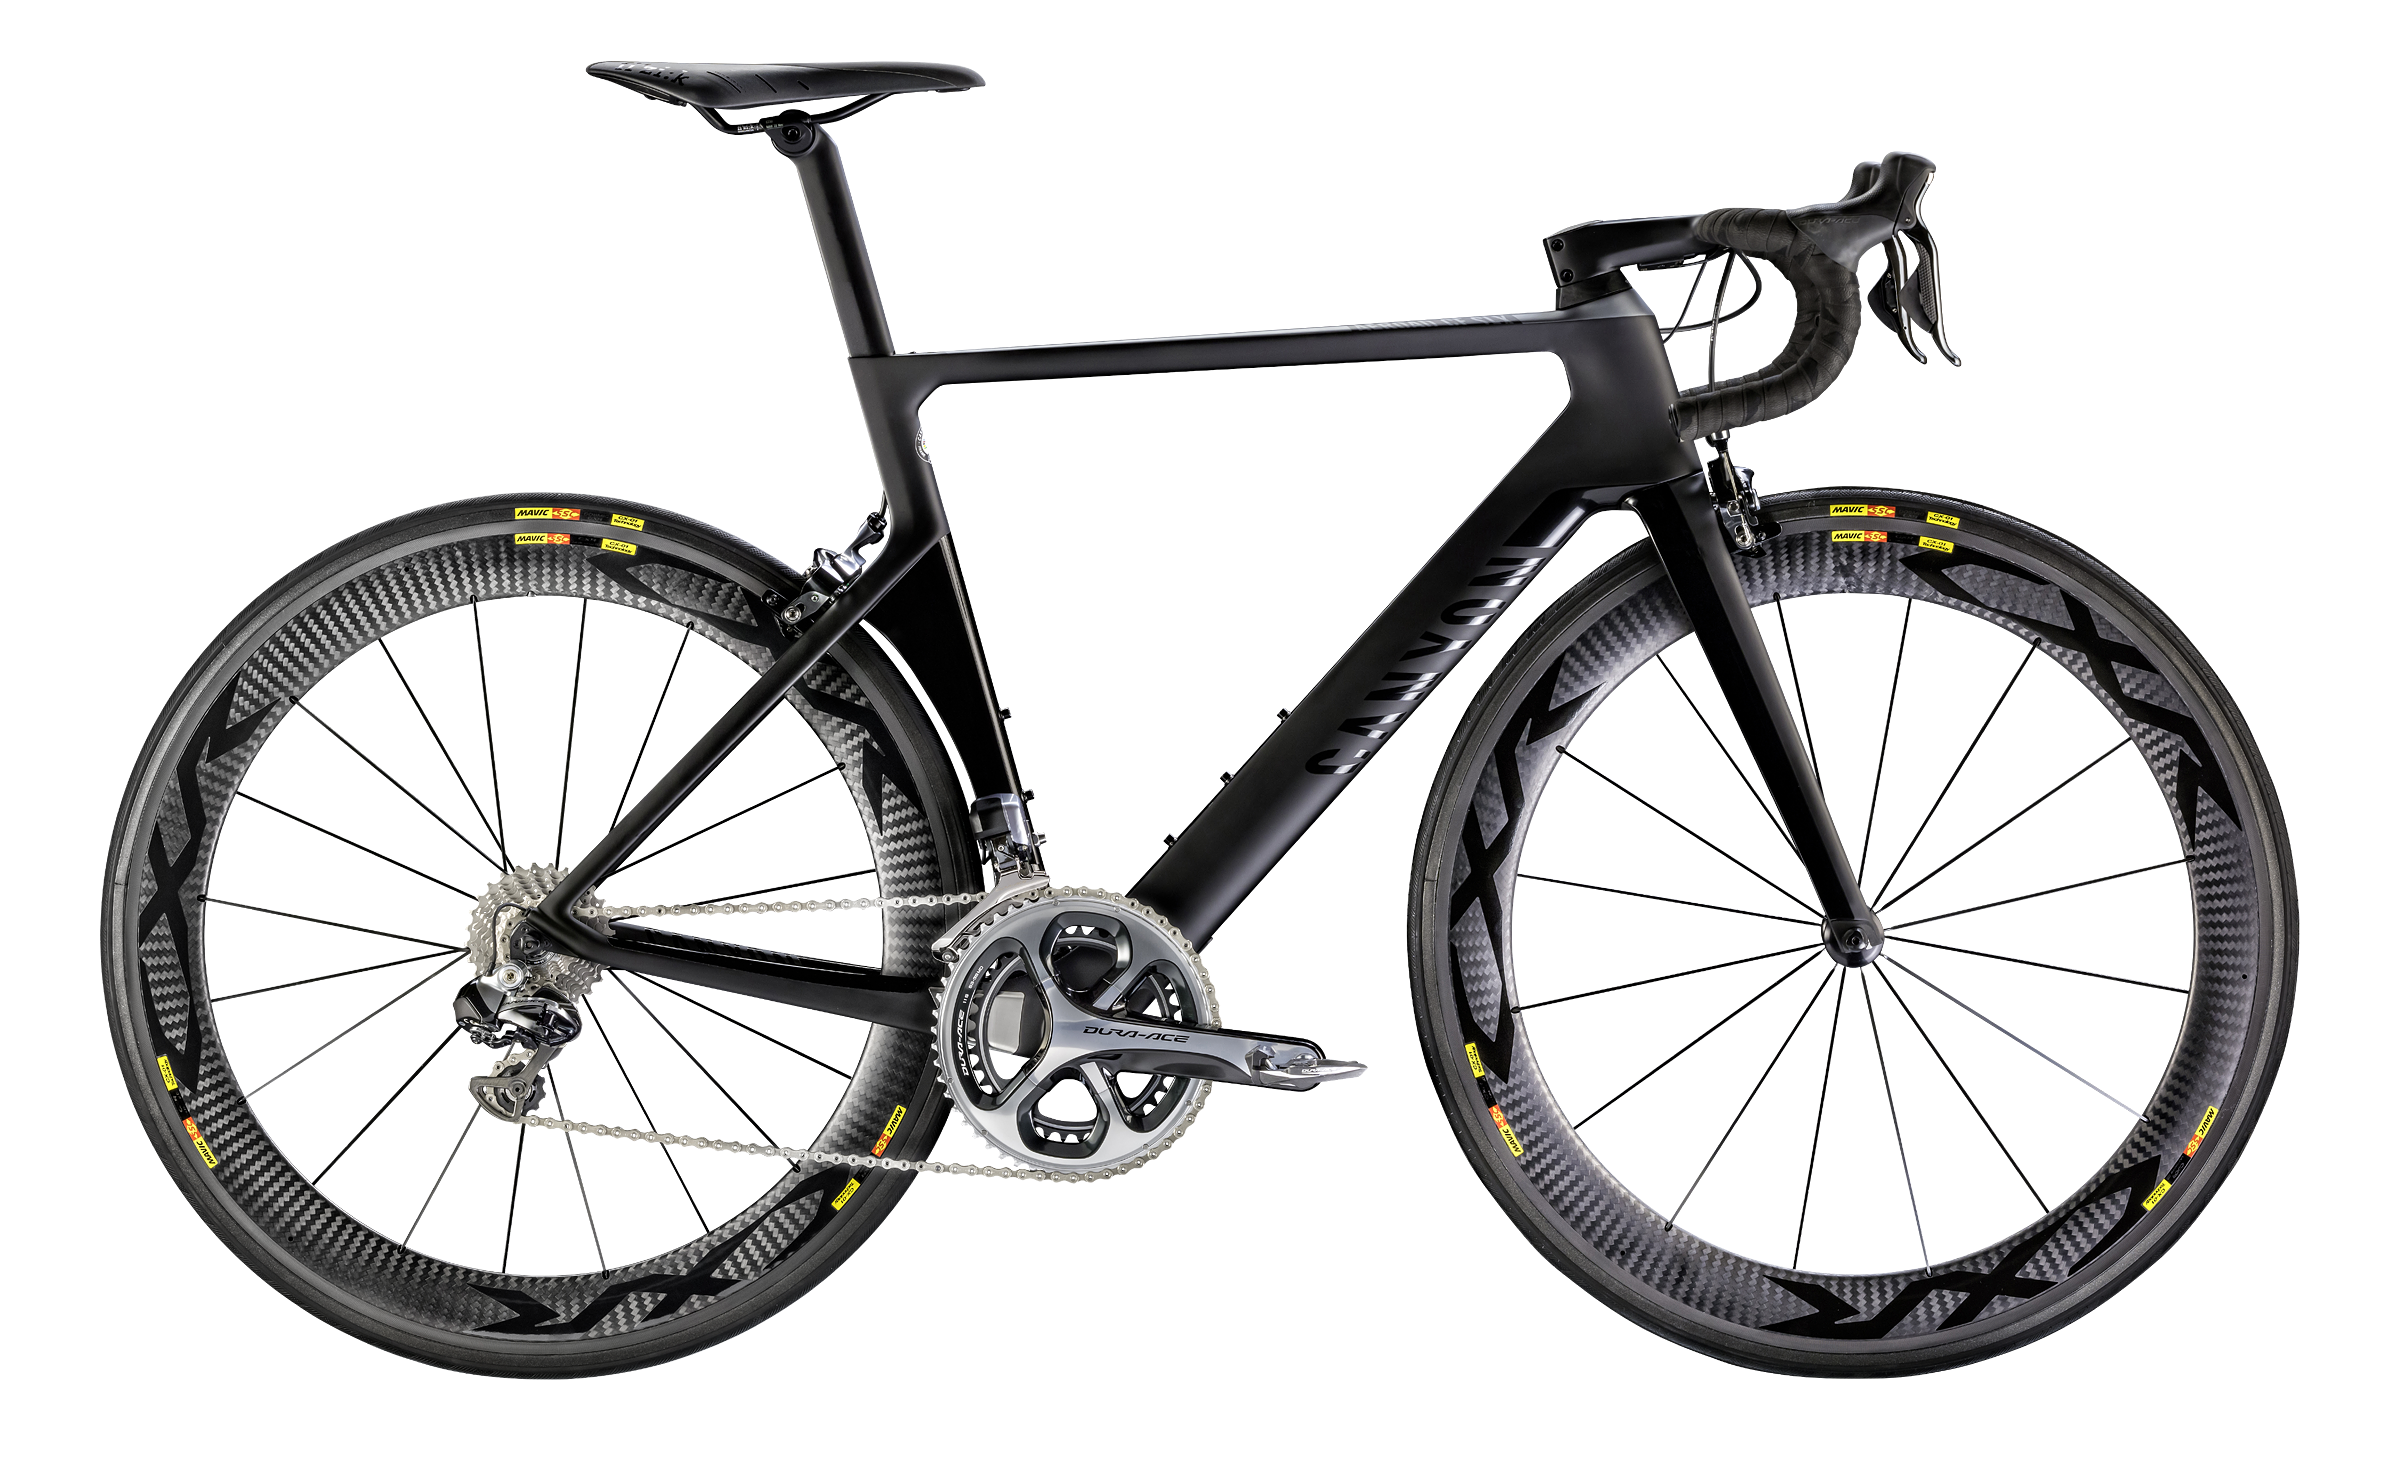 Canyon Aeroad Aeroad Cf Slx 9 0 Team Kat Canyon Bicycle